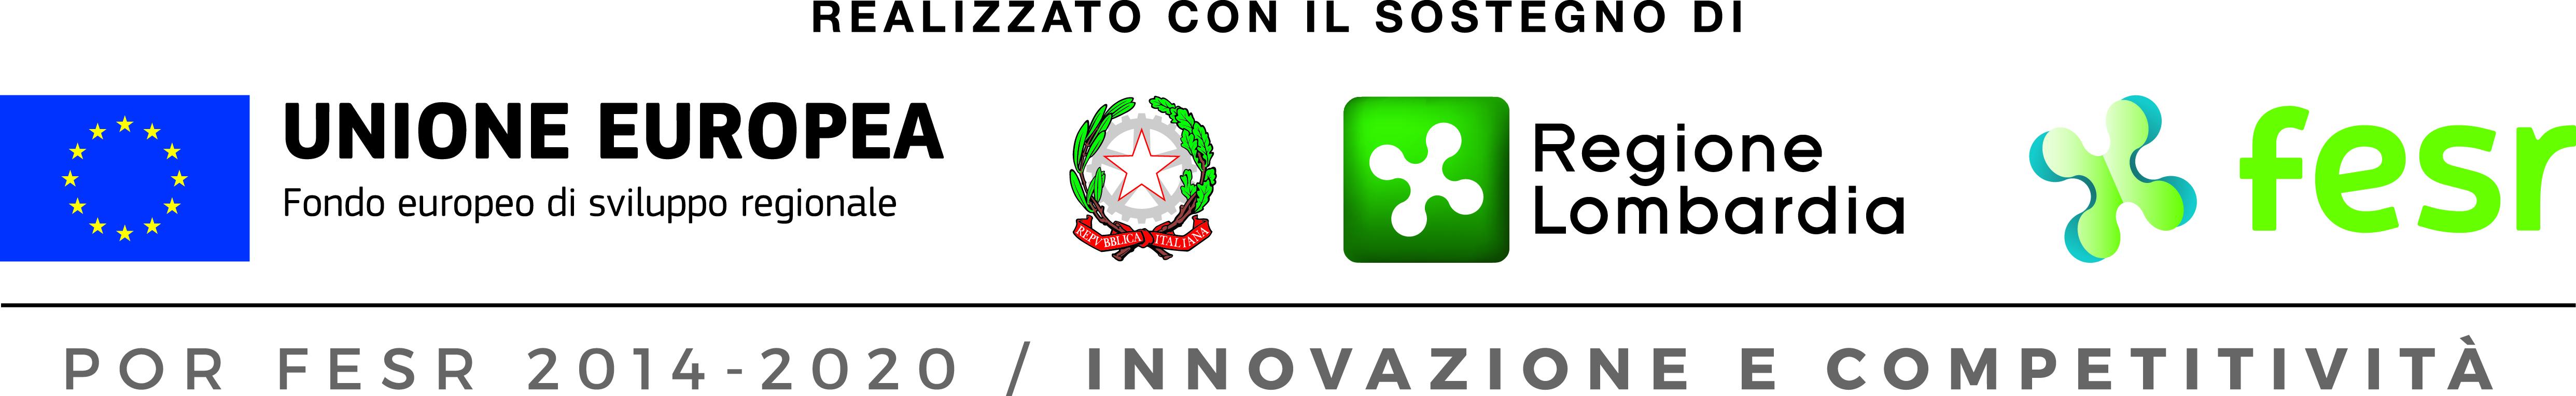 Logo UE - Logo regione lombardia - Logo Fesr